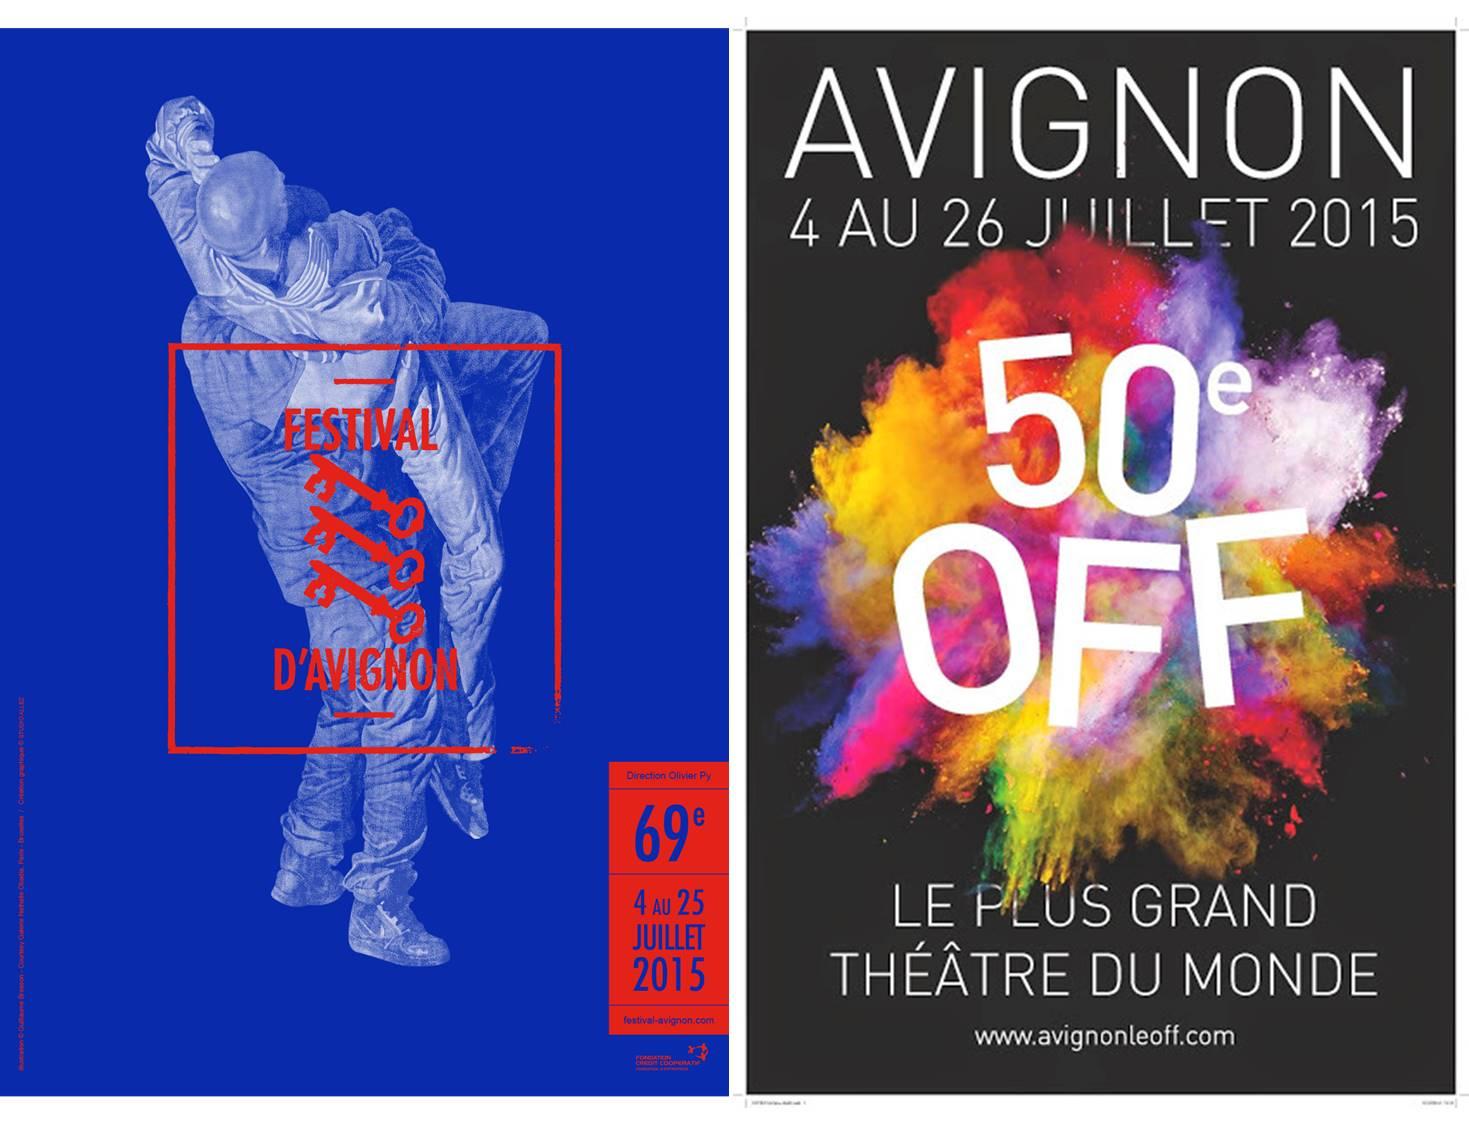 avignon festival in off lydie 39 s house. Black Bedroom Furniture Sets. Home Design Ideas